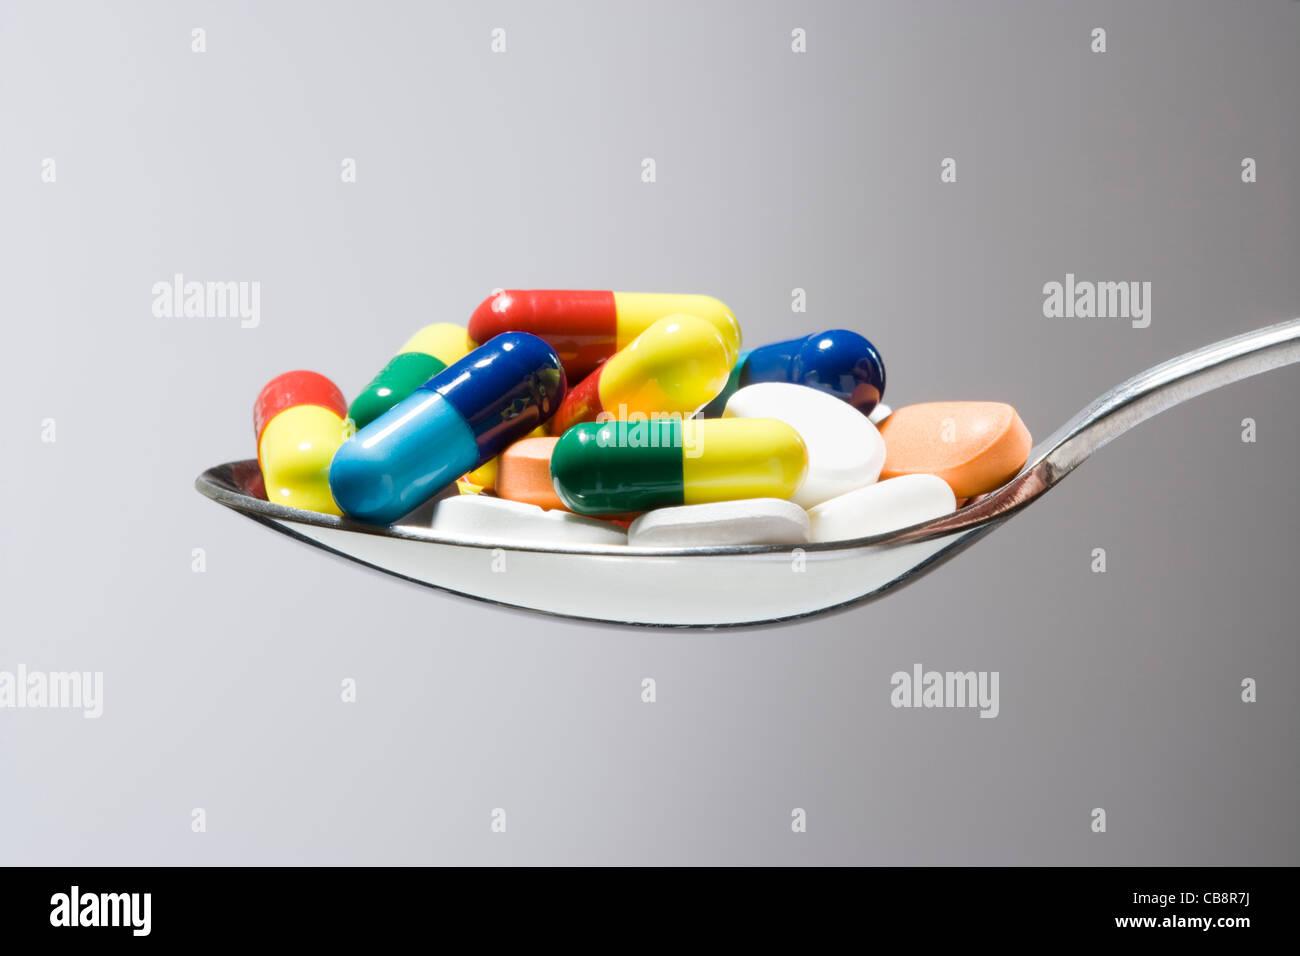 Pills on spoon. - Stock Image